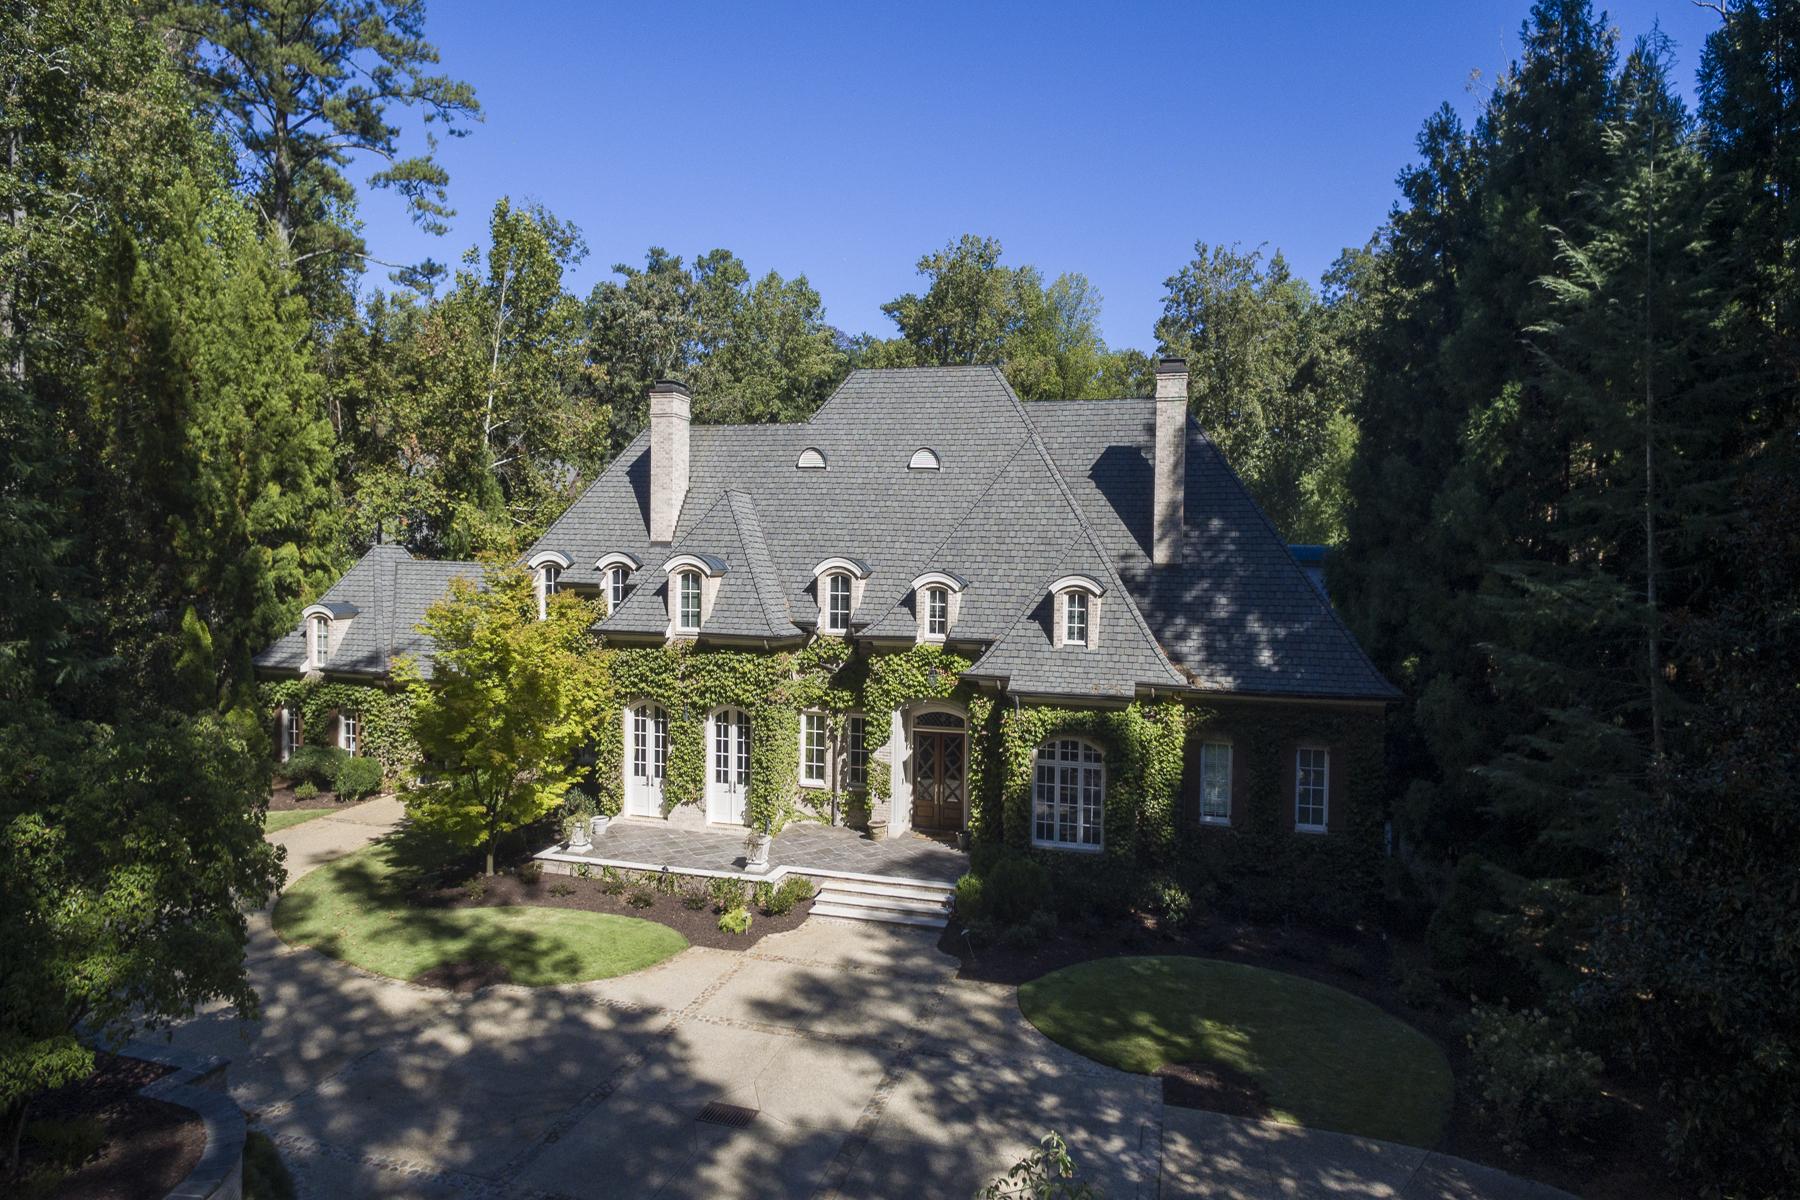 独户住宅 为 销售 在 Gorgeous Gated Estate Property With Separate Large Guest House 714 W Conway Drive NW Buckhead, 亚特兰大, 乔治亚州, 30327 美国